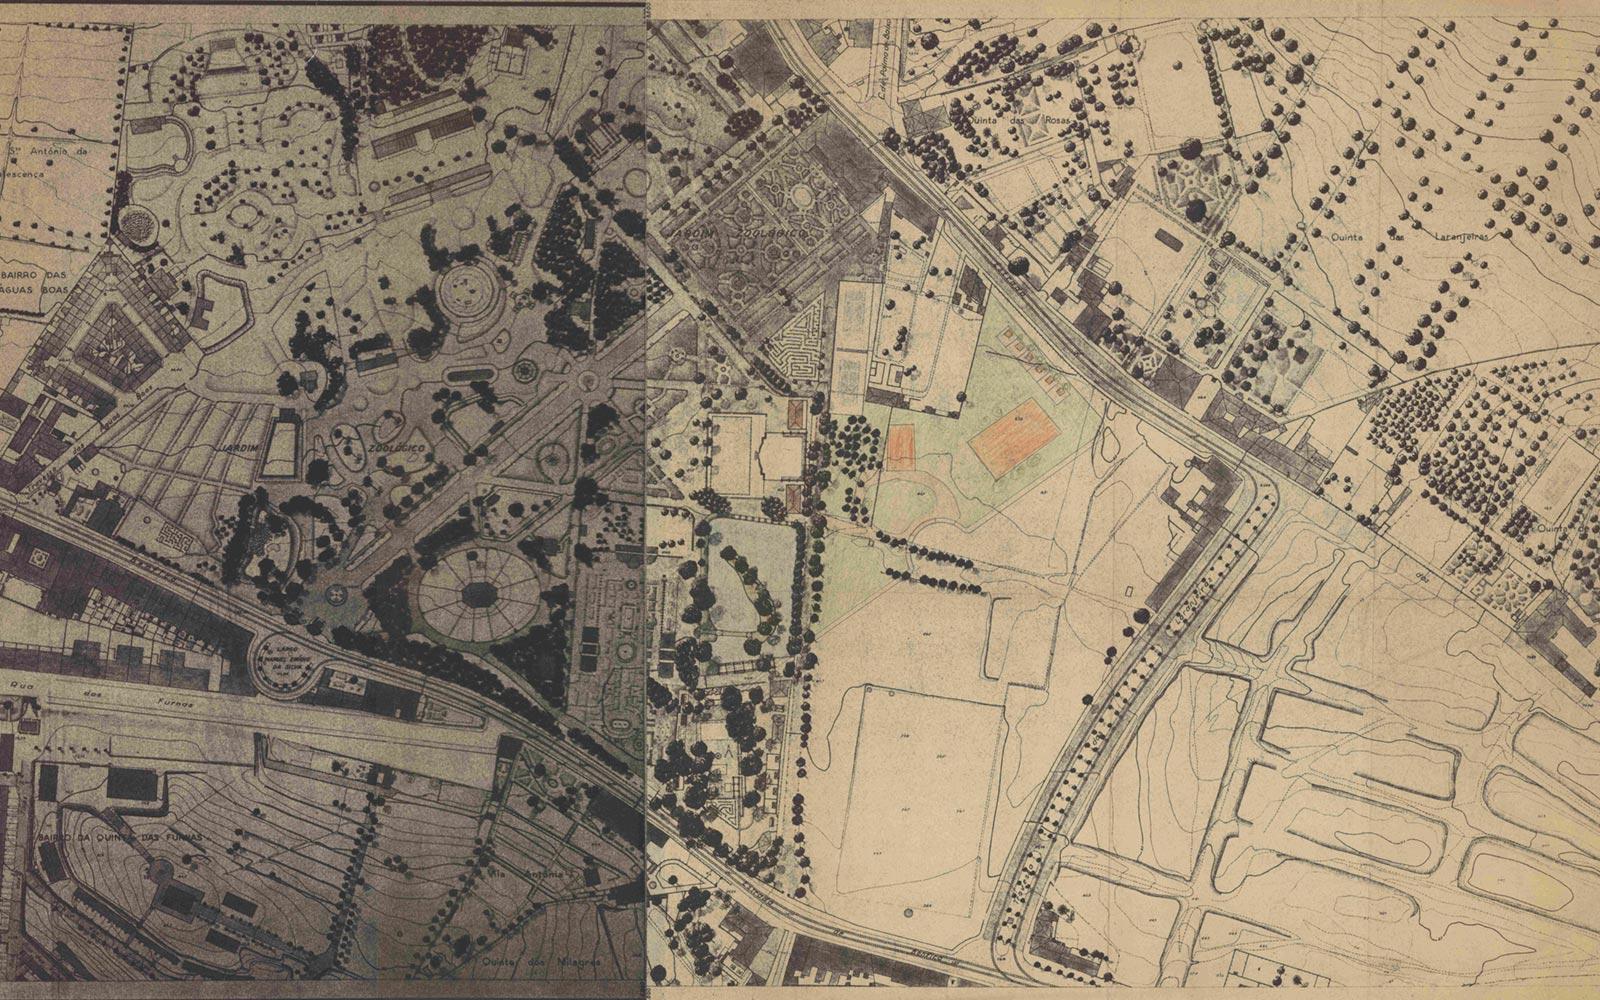 Jardim Zoológico de Lisboa : planta geral / Raul Lino, 1935-1972.